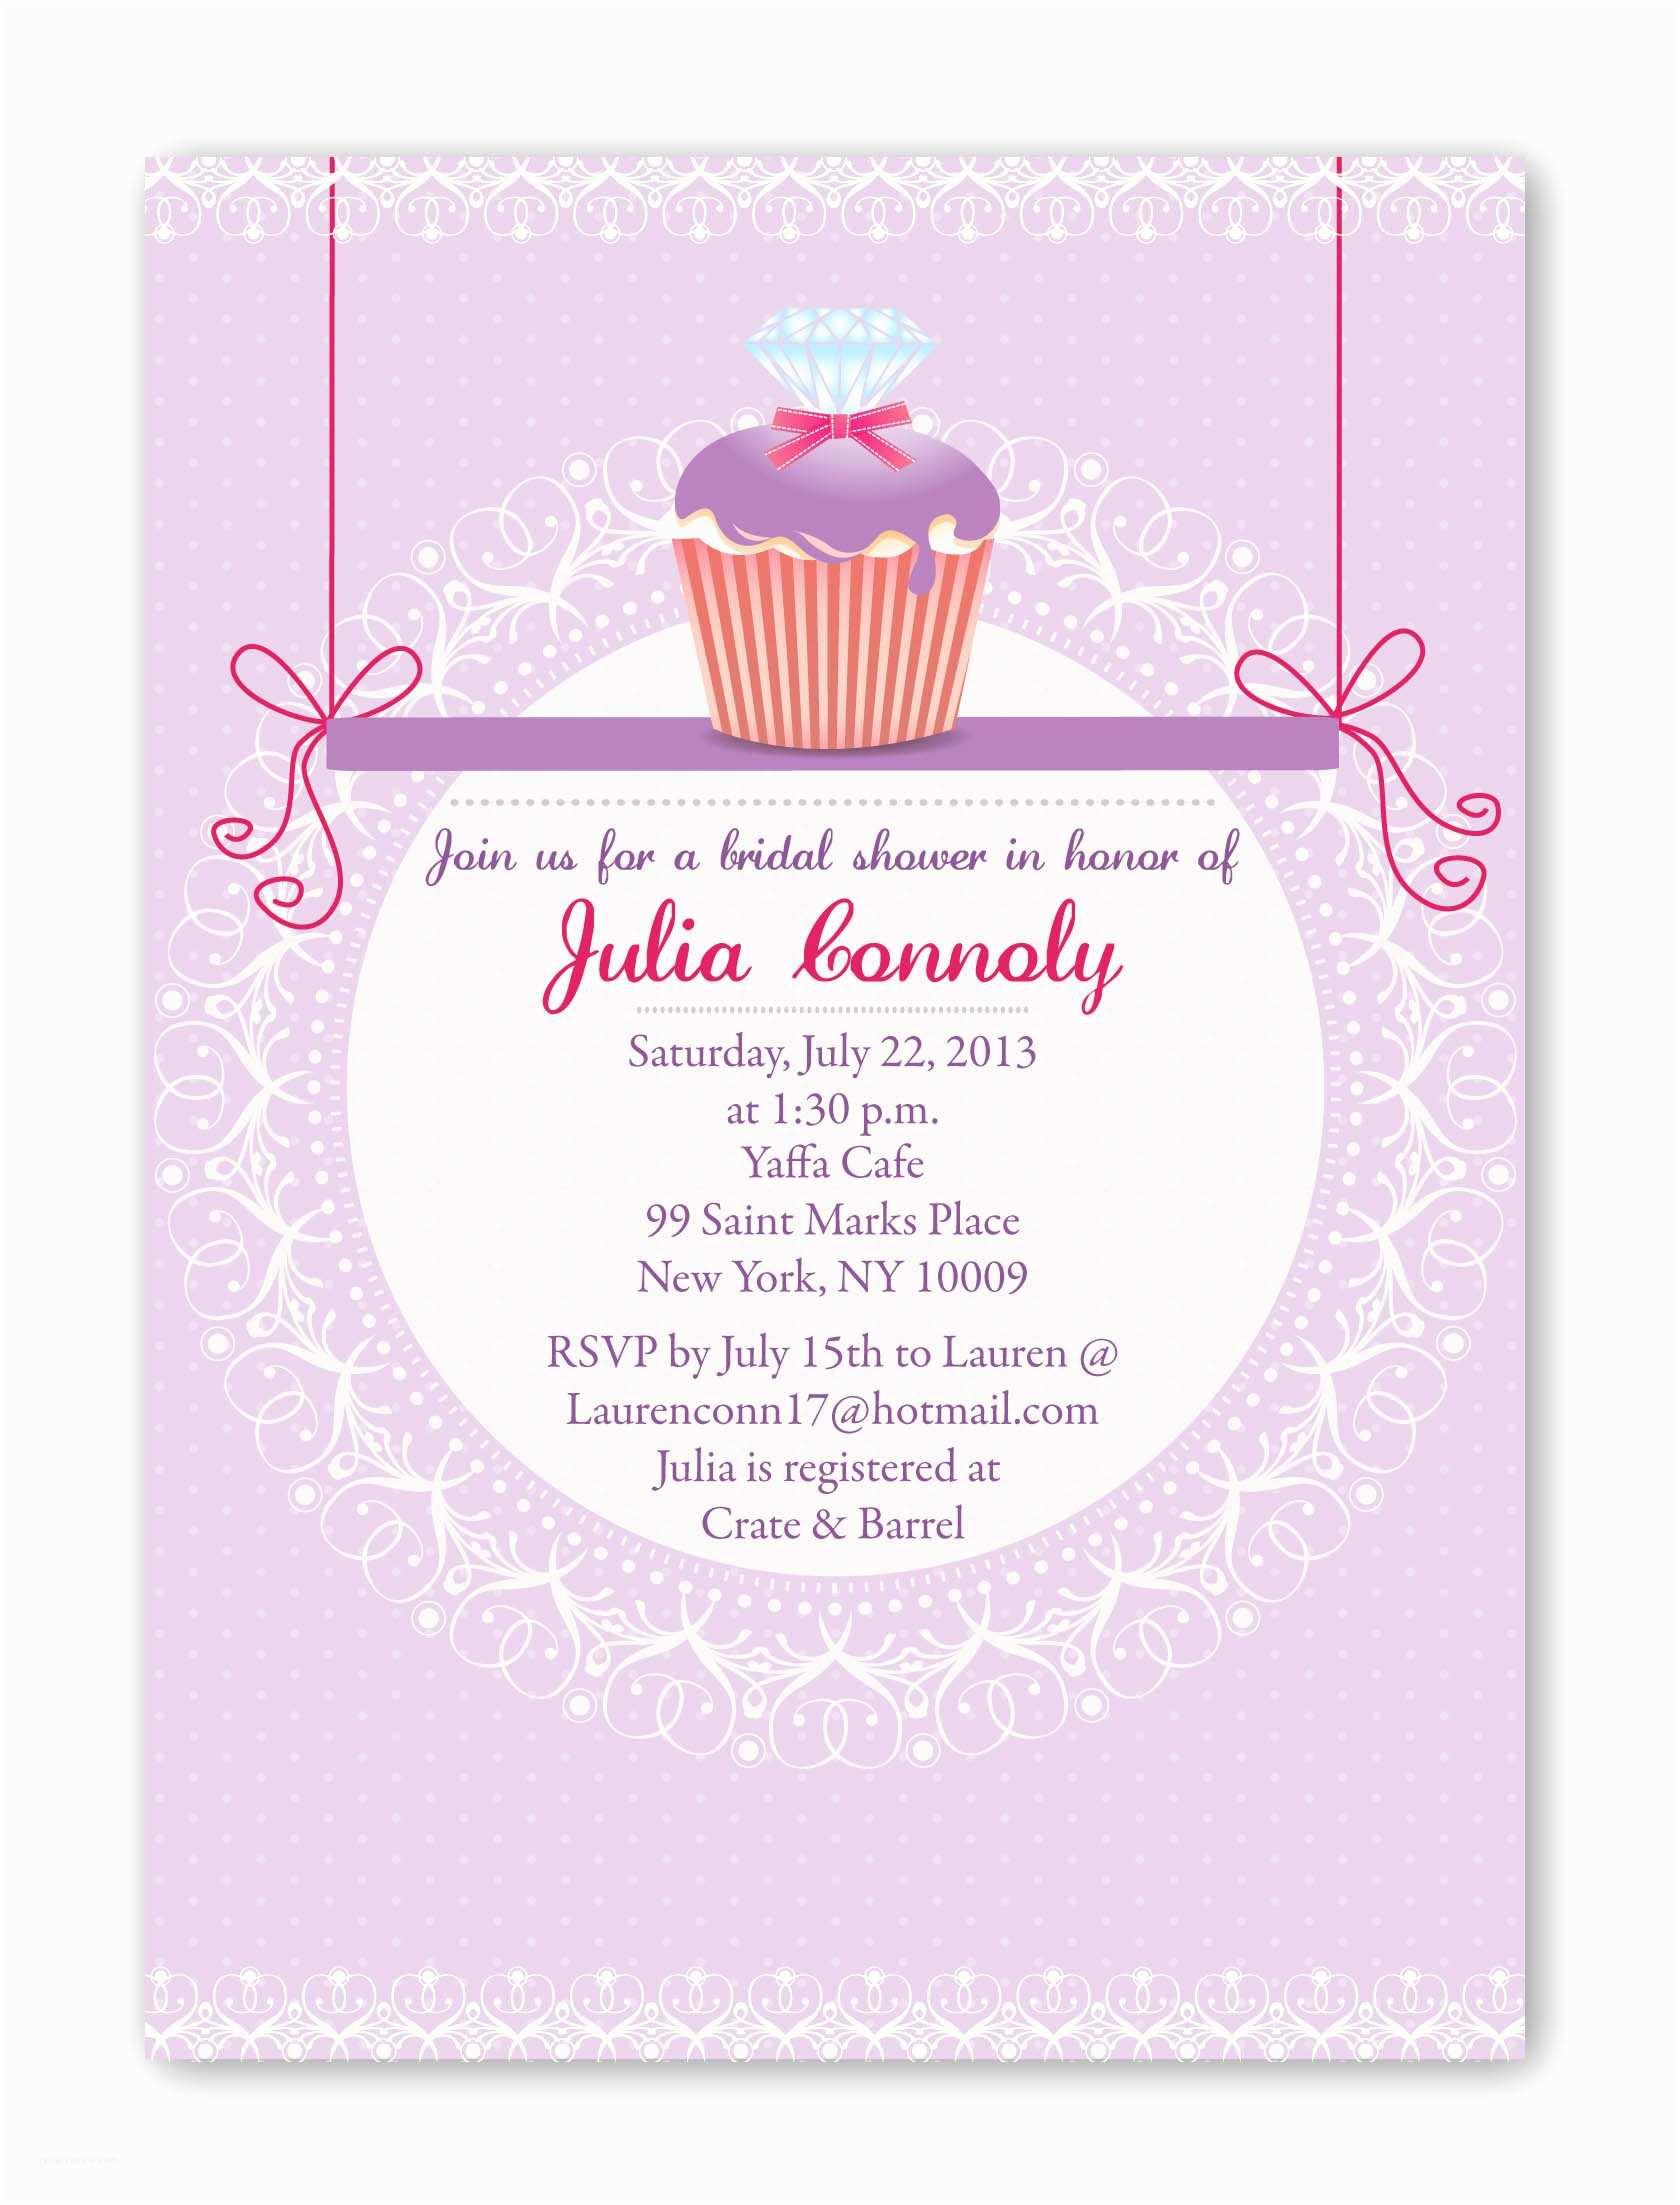 Wedding Shower Invitations Bridal Shower Invitation Rose Image